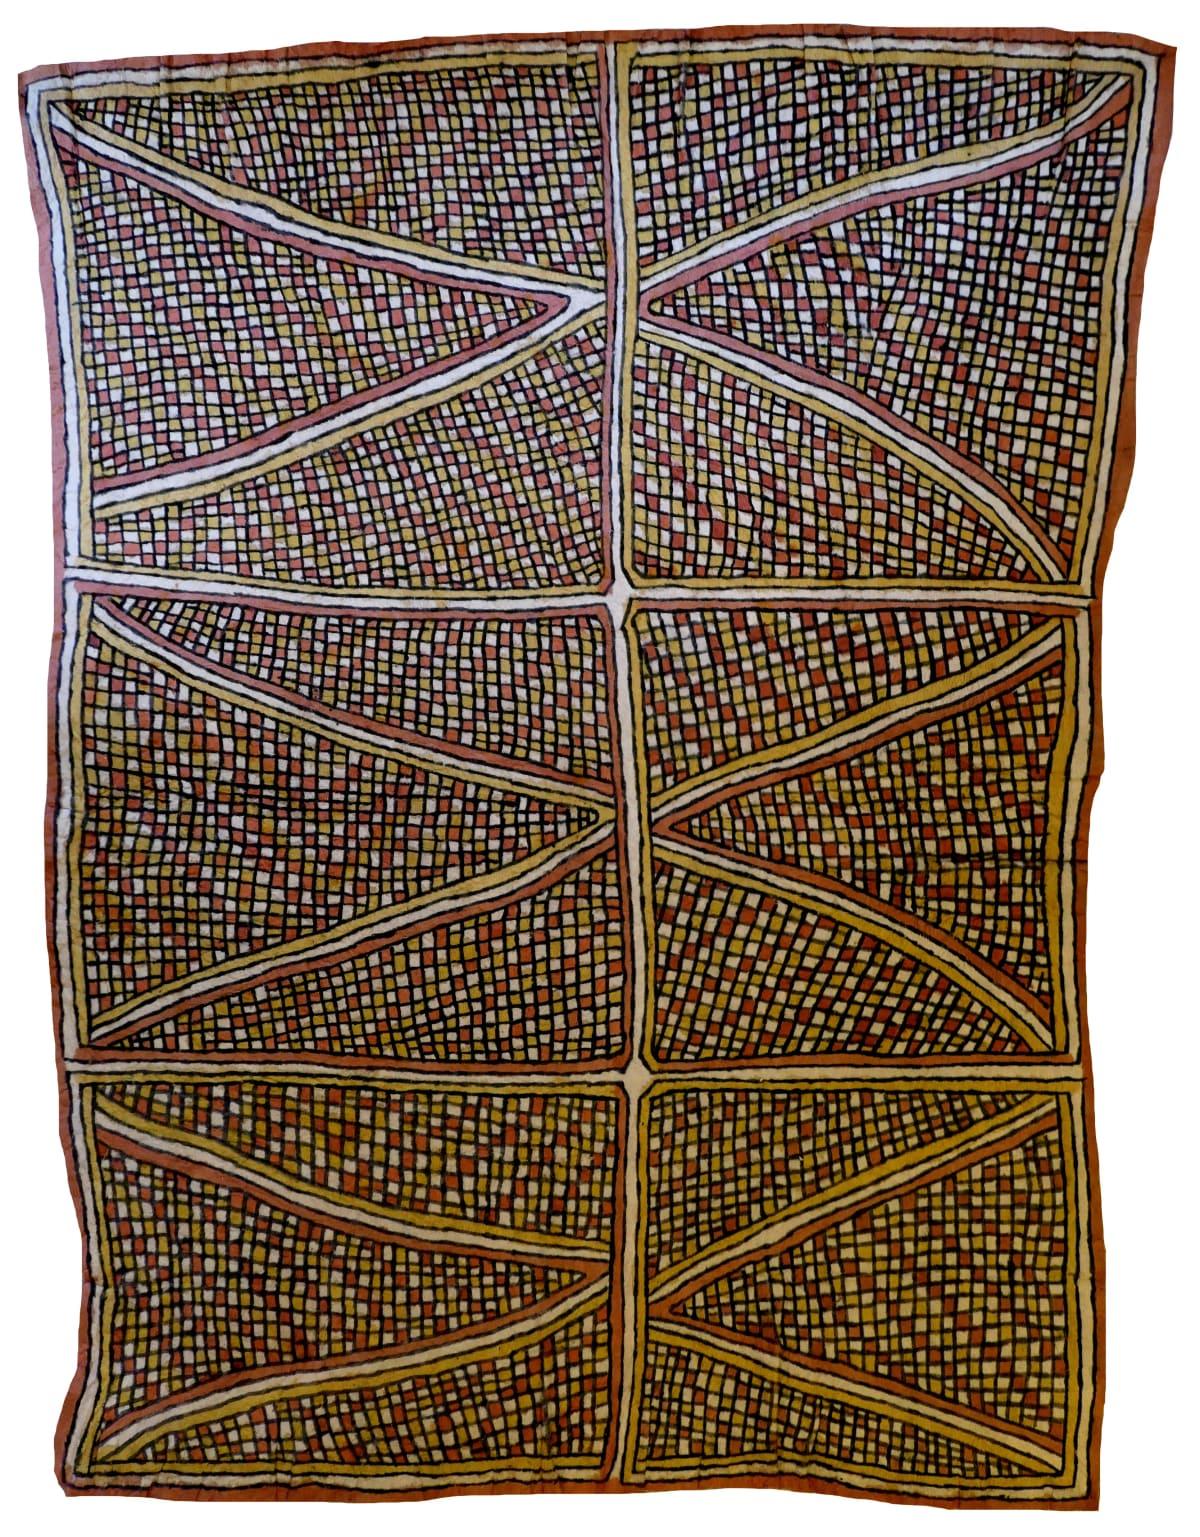 Mala Nari (Matosi) Dahoru'e ohu'o tuböre une natural pigments on nioge (barkcloth) 115 x 90.5 cm